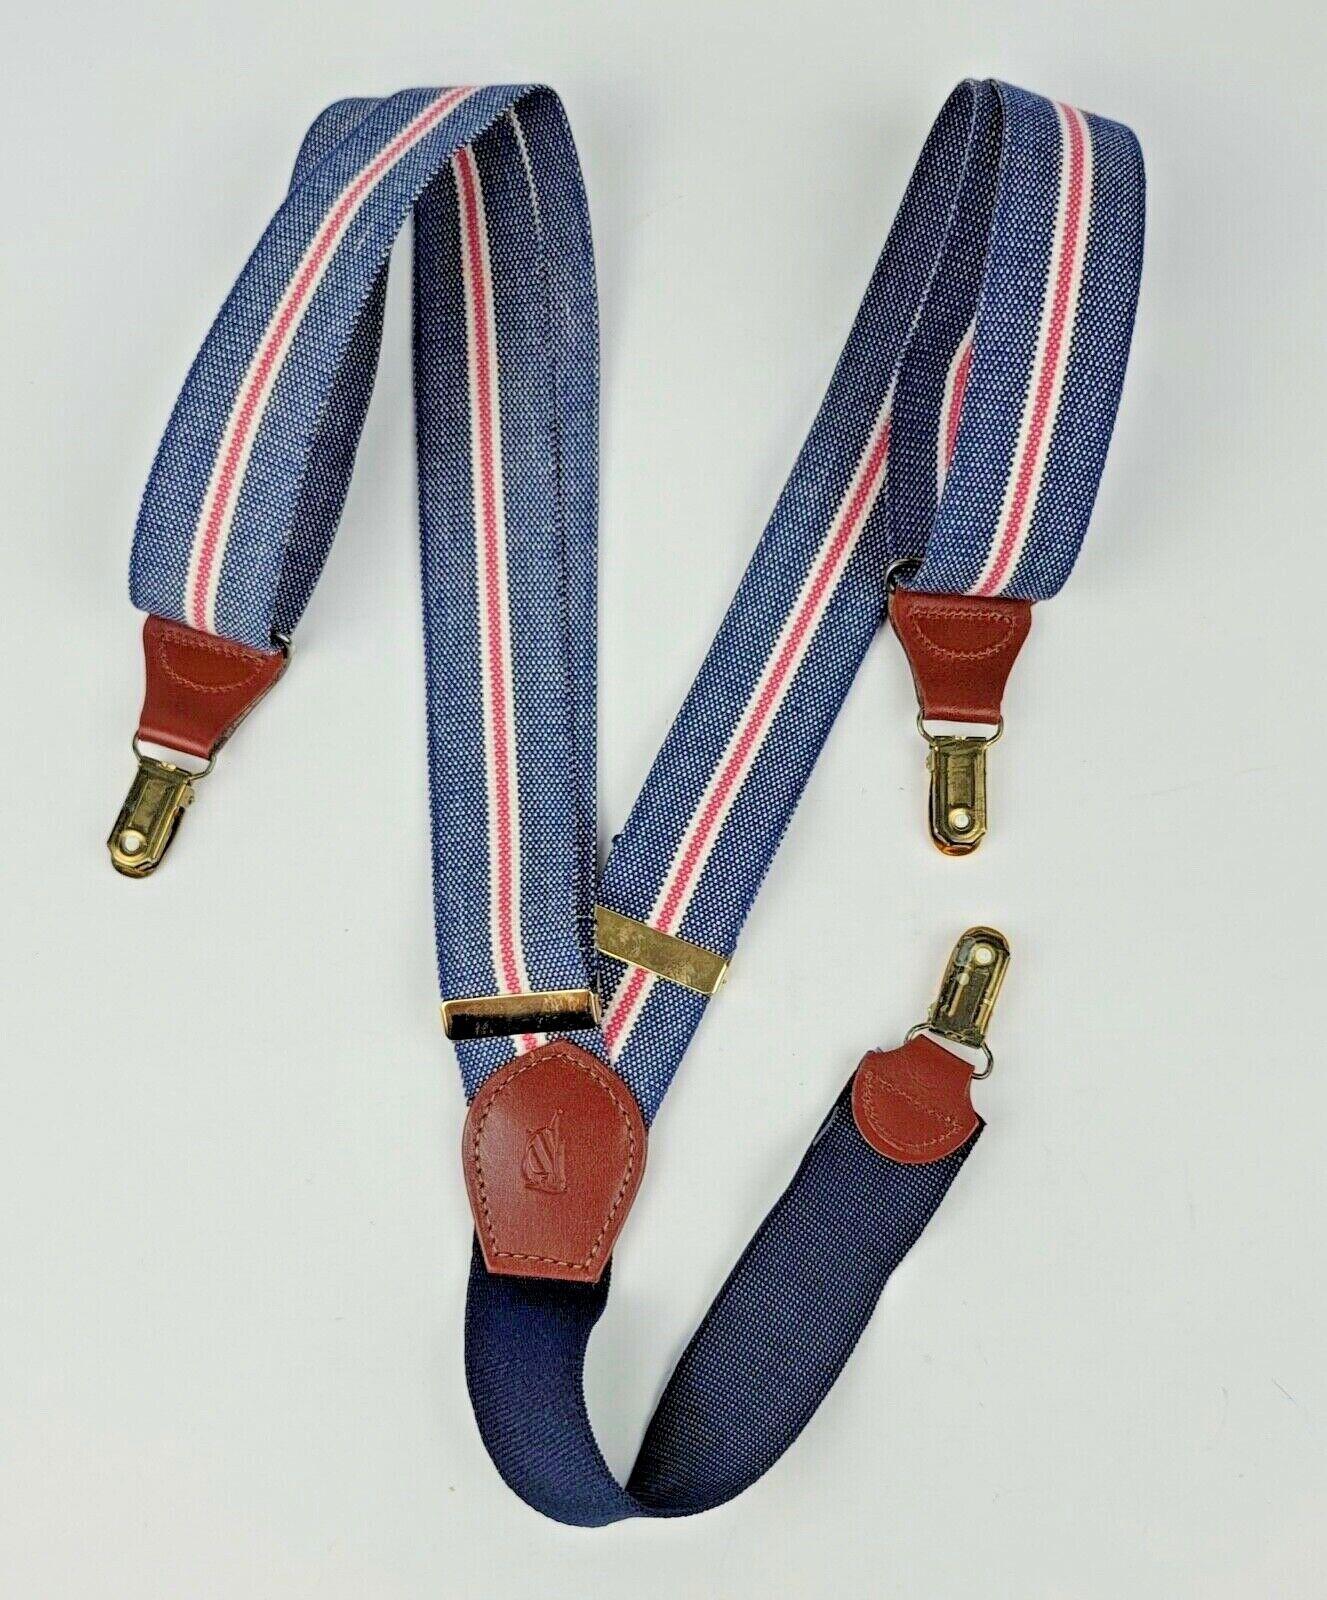 Nautica Suspenders Leather Clip Red White & Blue 1 3/8